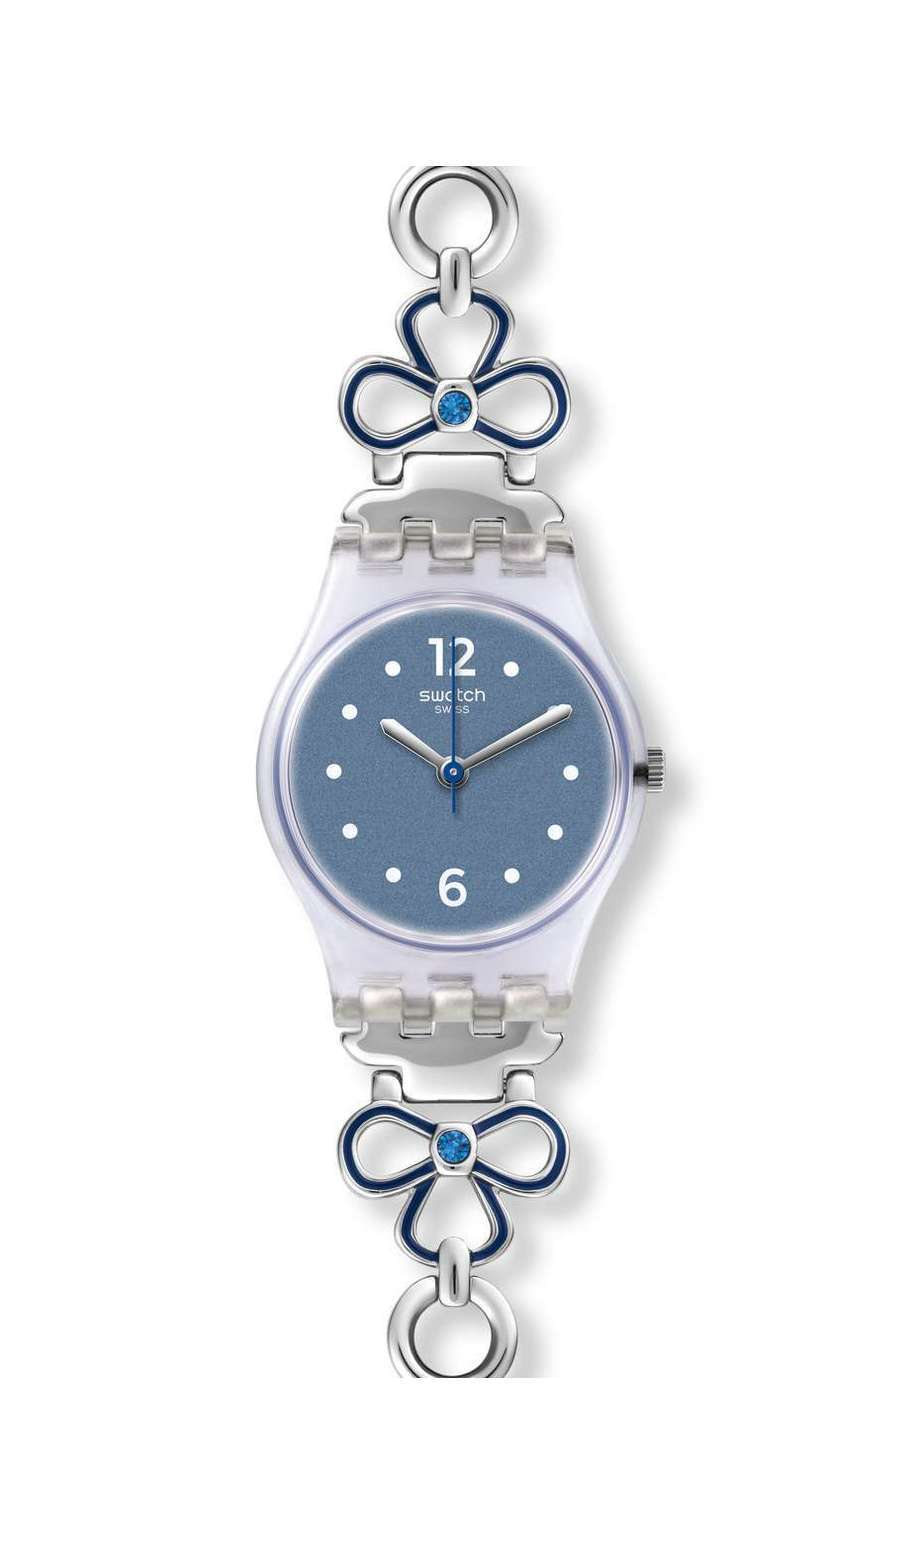 Swatch - LADY BOW - 1